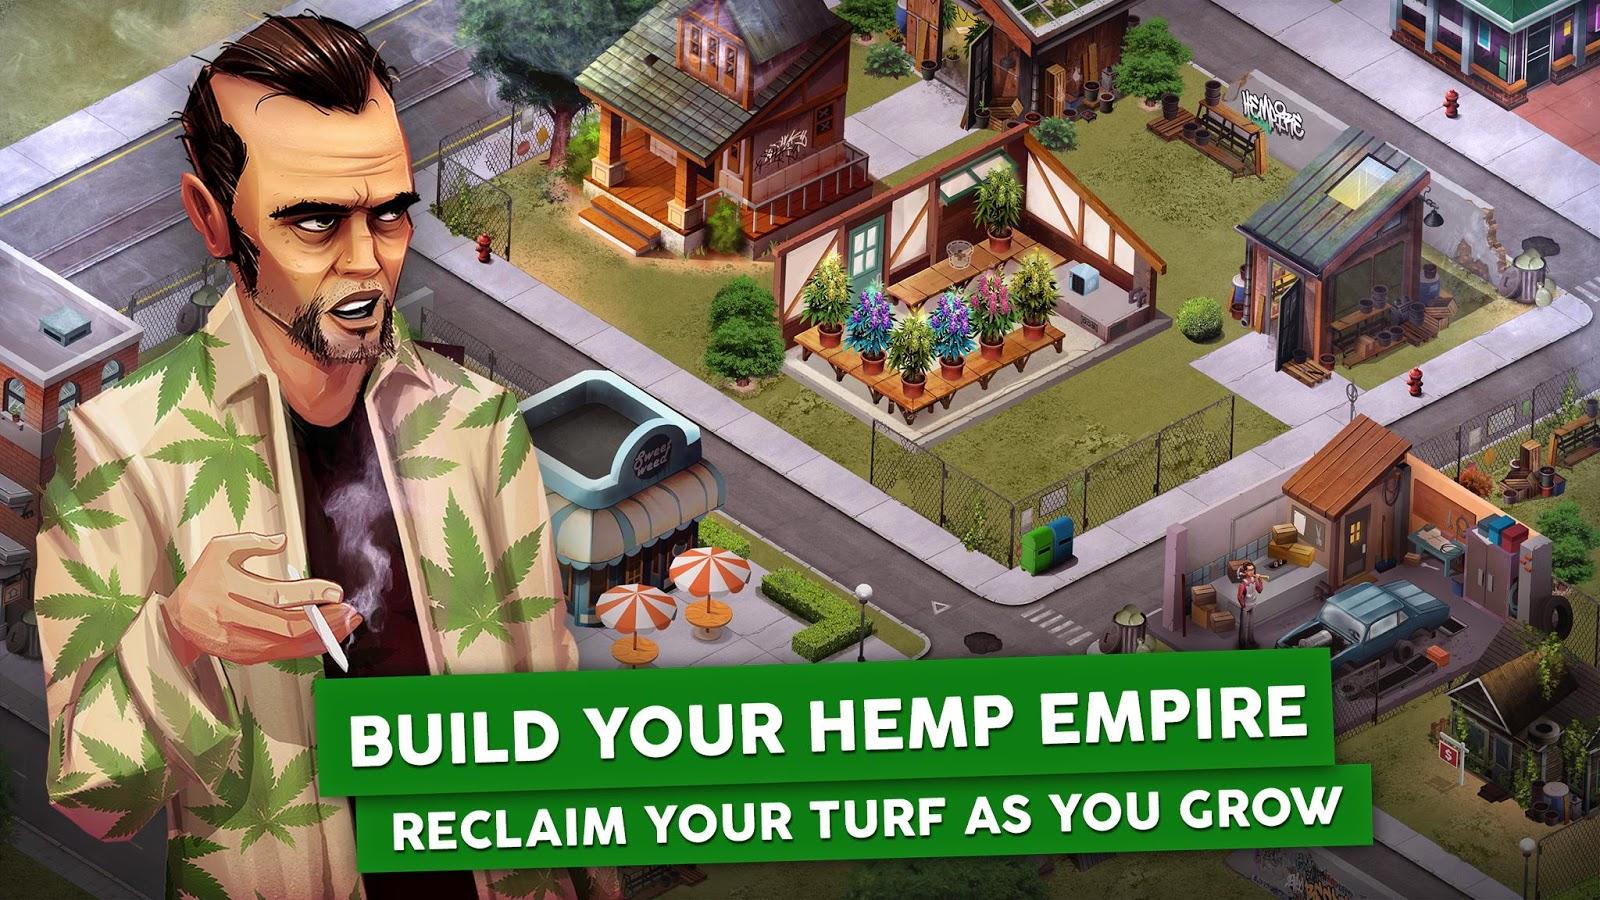 Hempire-Plant-Growing-Apk-Mod